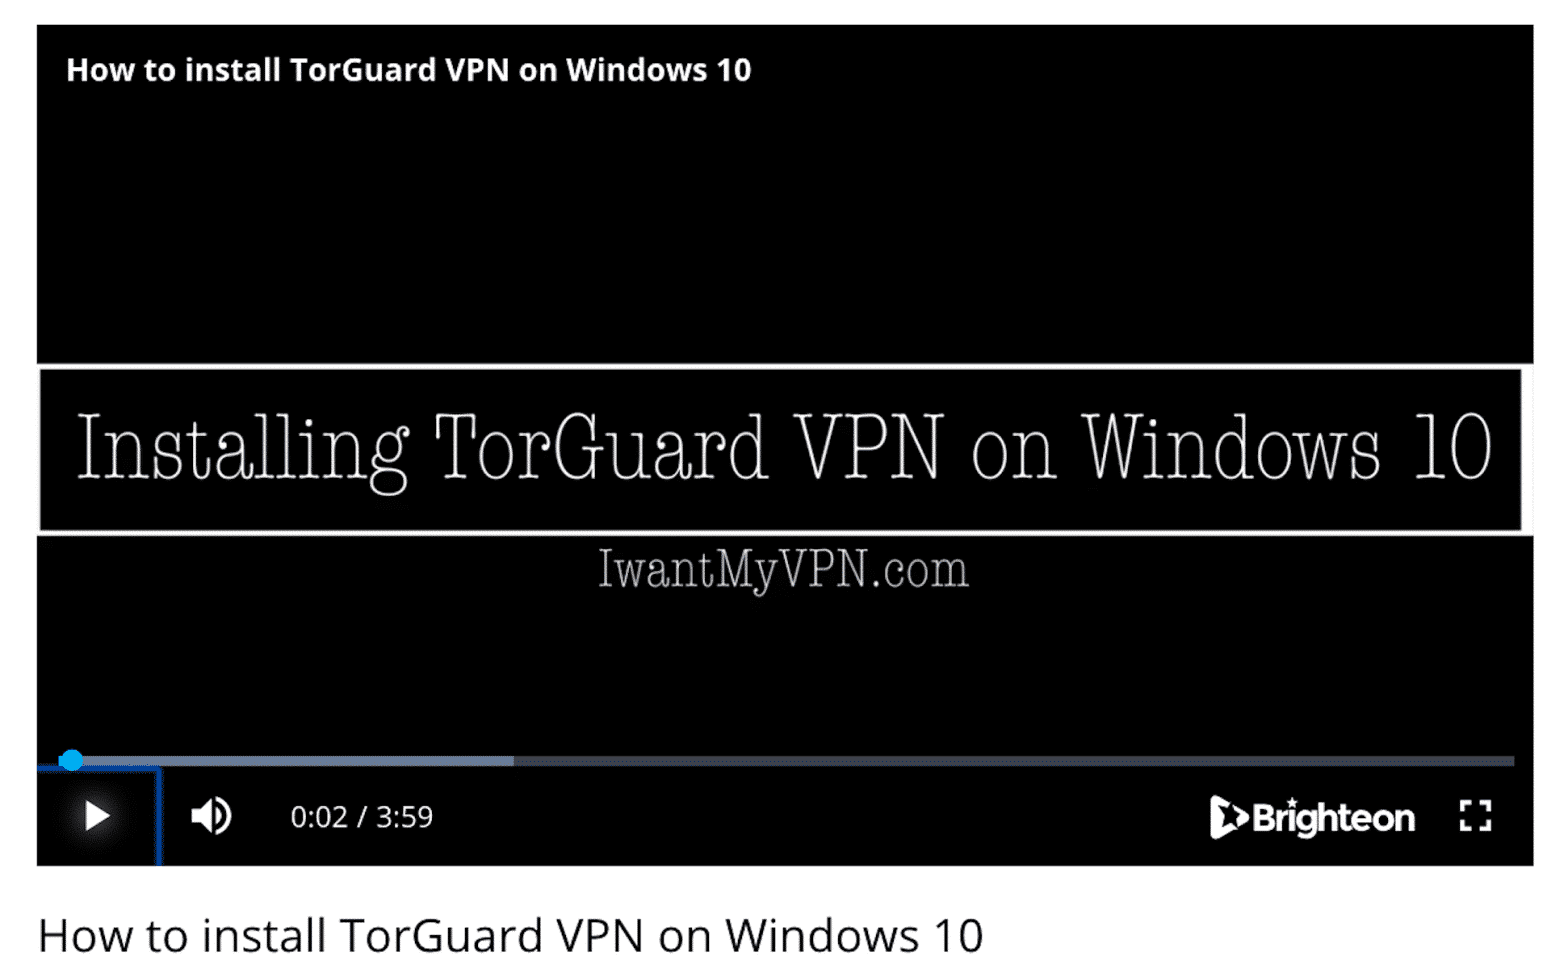 Installing TorGuard VPN on Windows 10